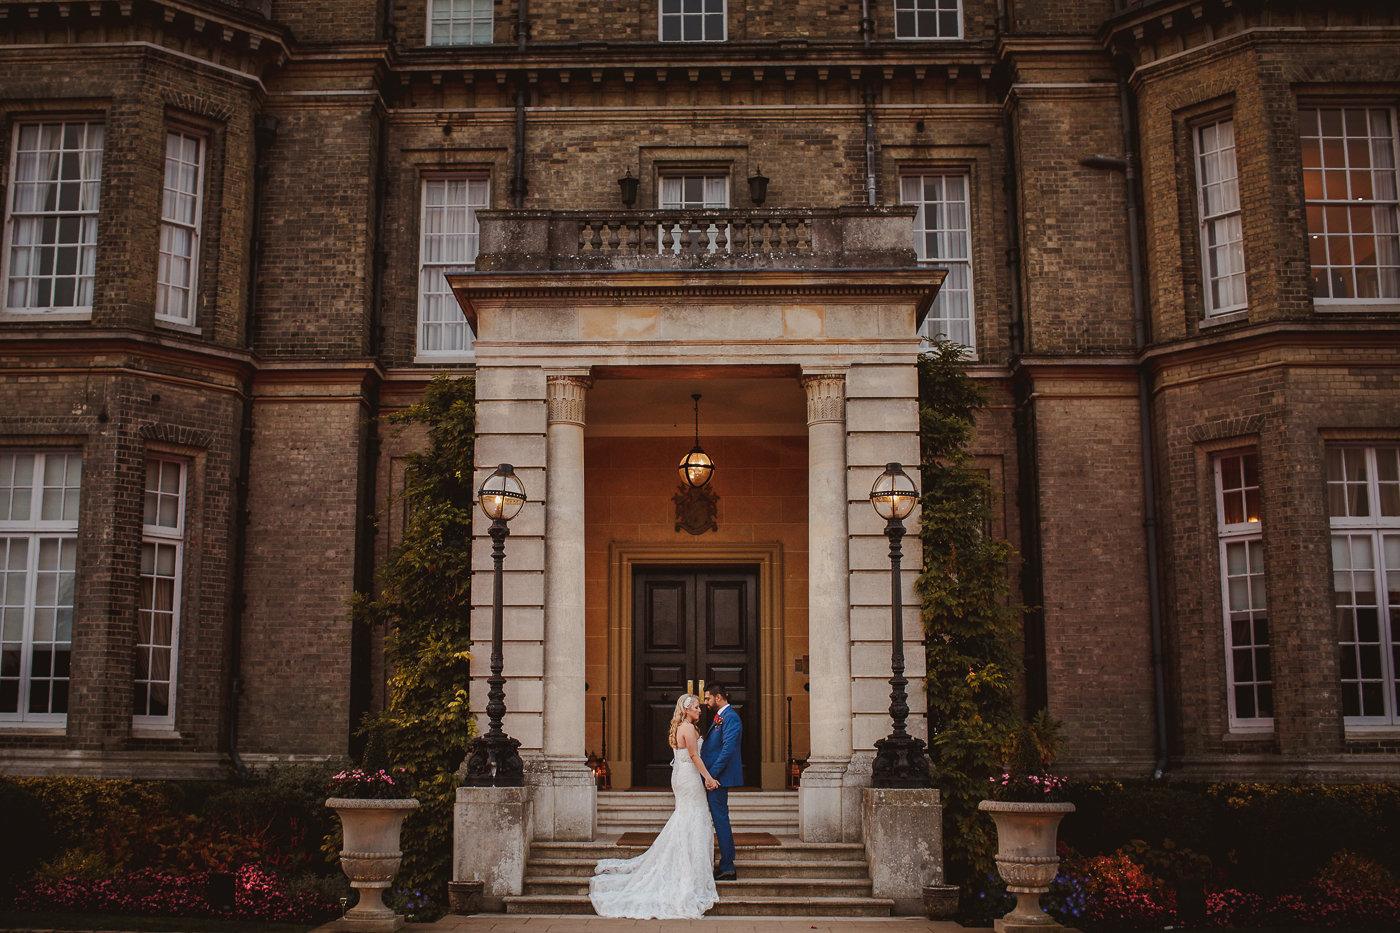 hedsor-house-wedding-photography-27.jpg